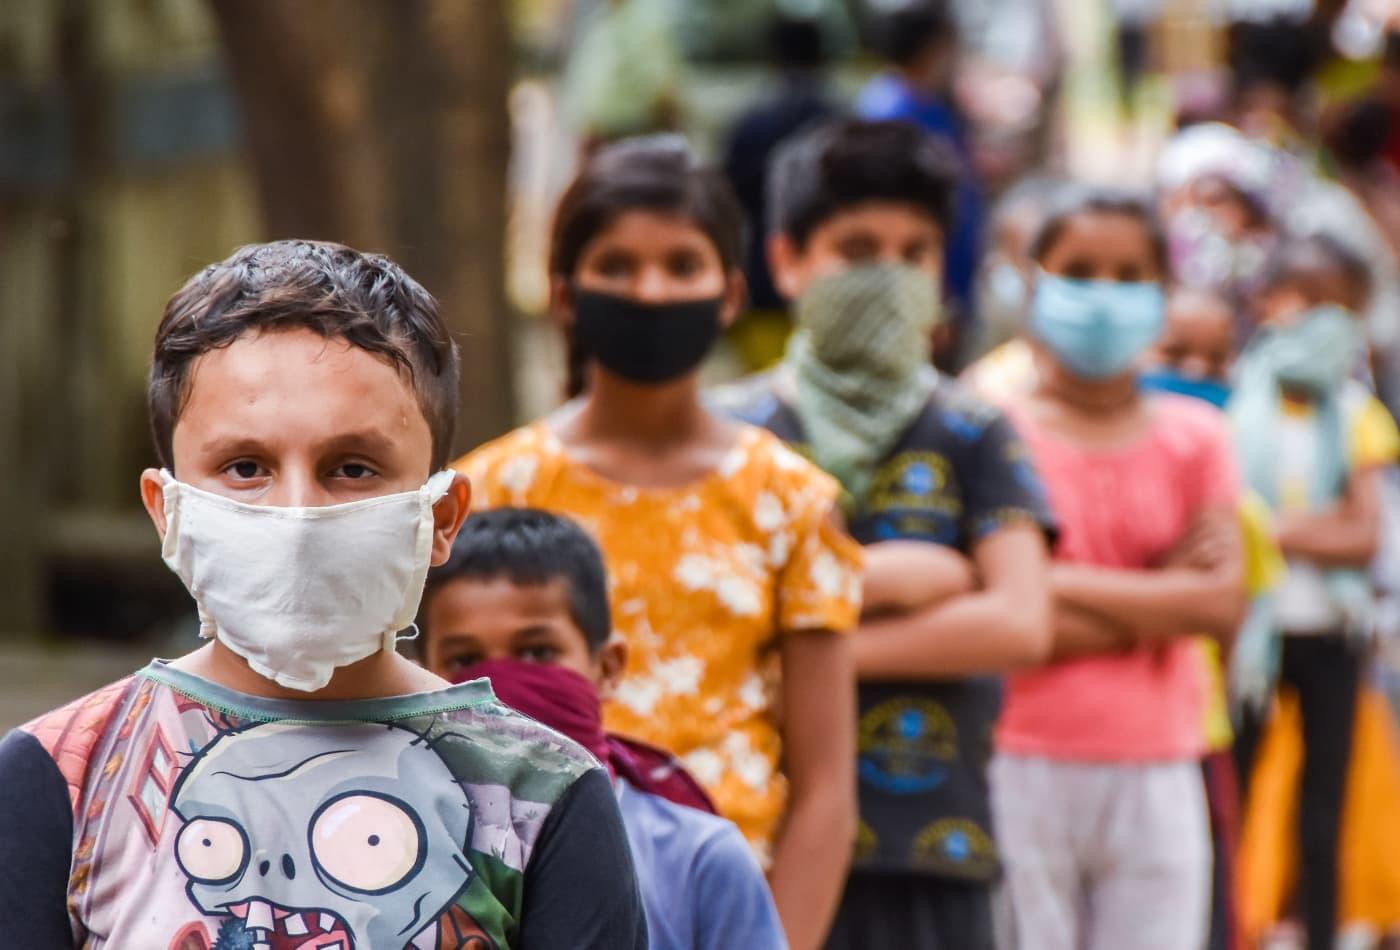 WHO raises alert on mysterious inflammatory disease in children that may be linked to coronavirus